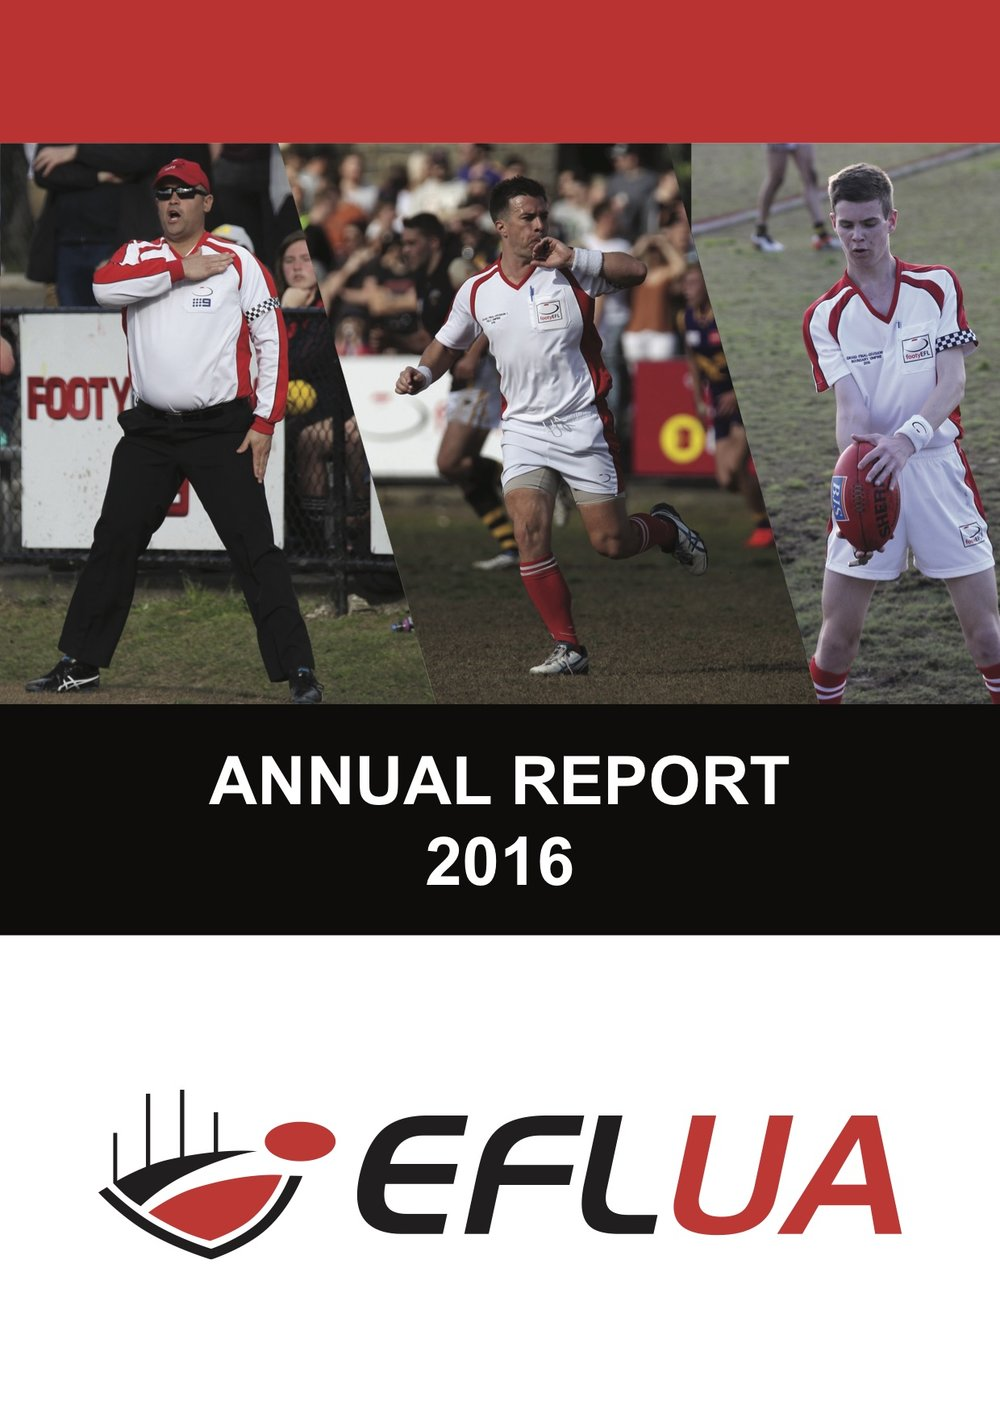 2016 Annual Report IMAGE.jpg